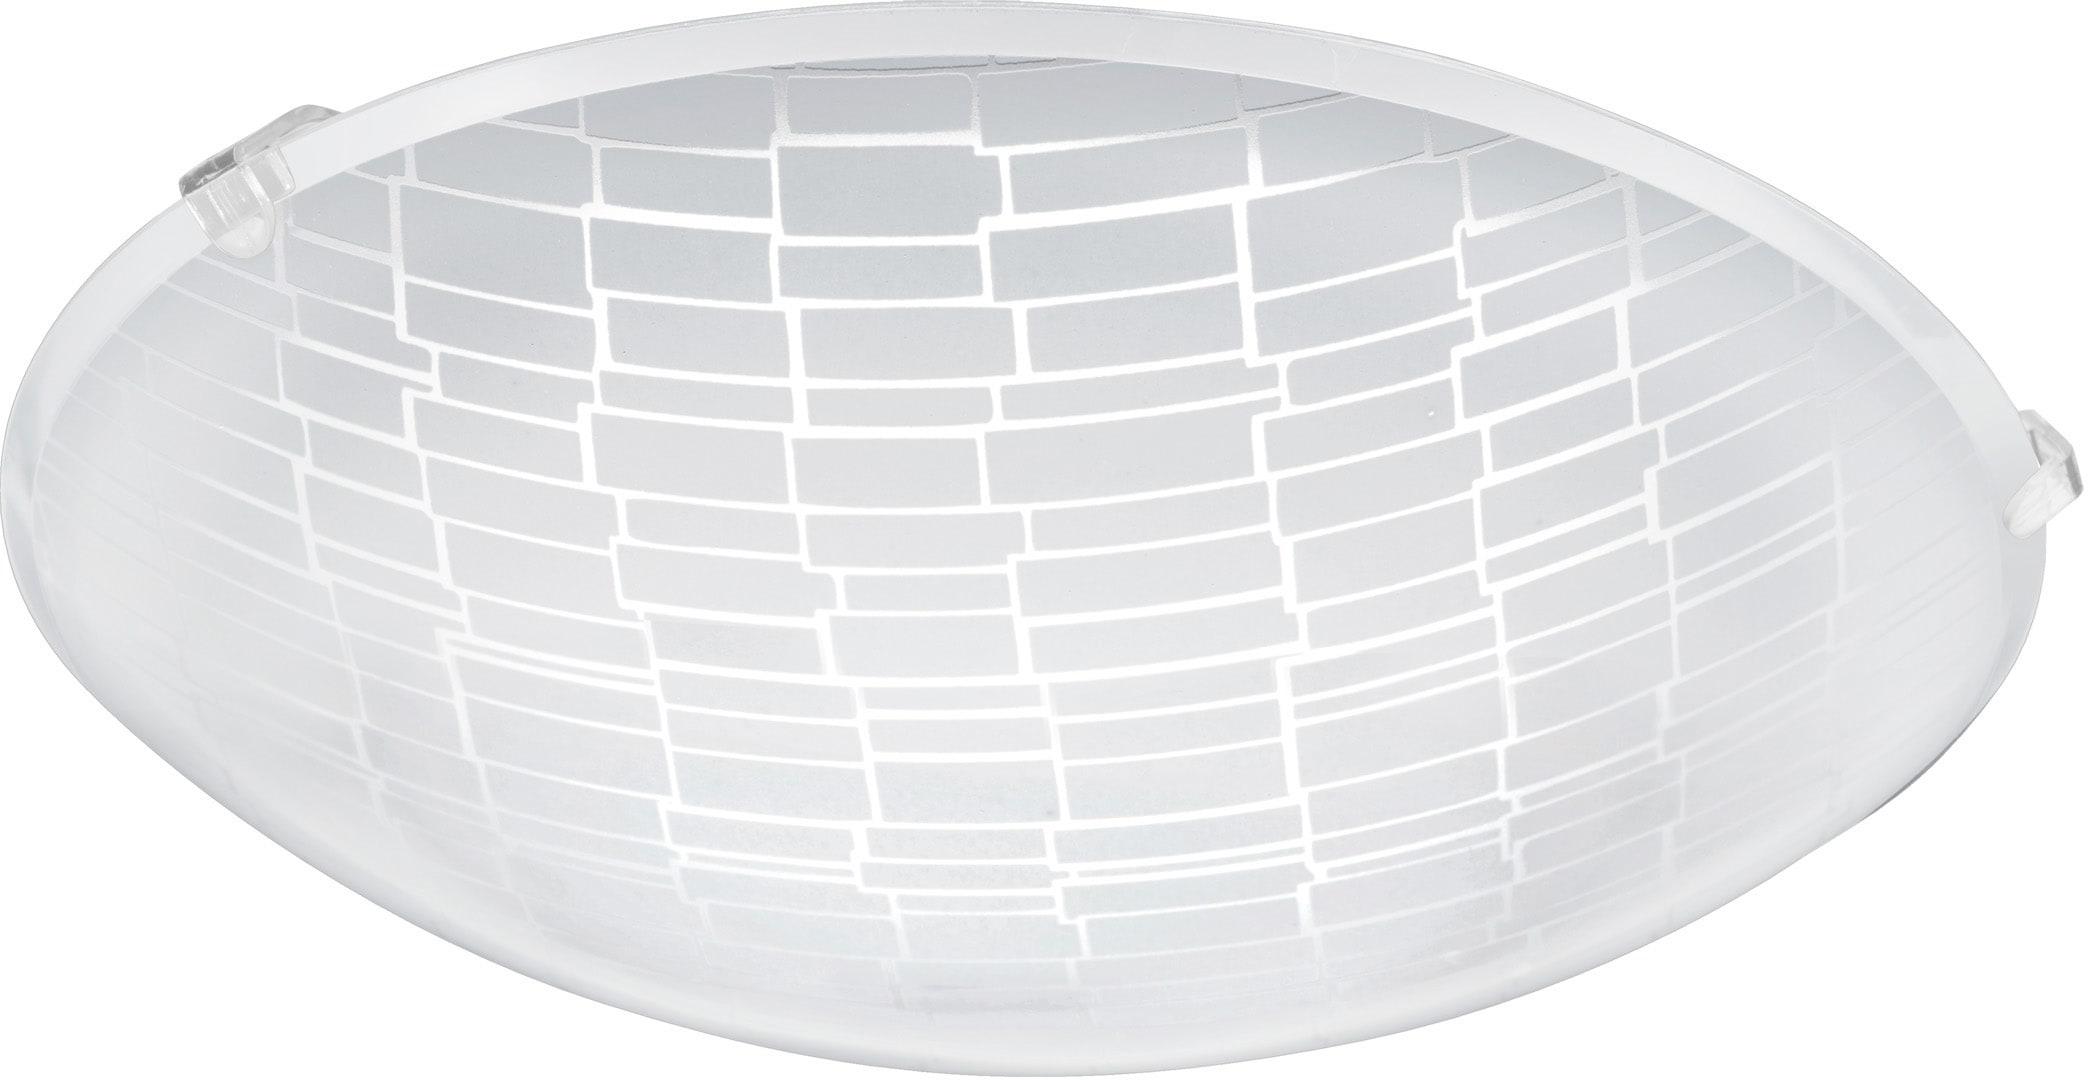 EGLO Deckenleuchte MALVA 1, LED-Board, Warmweiß, LED tauschbar